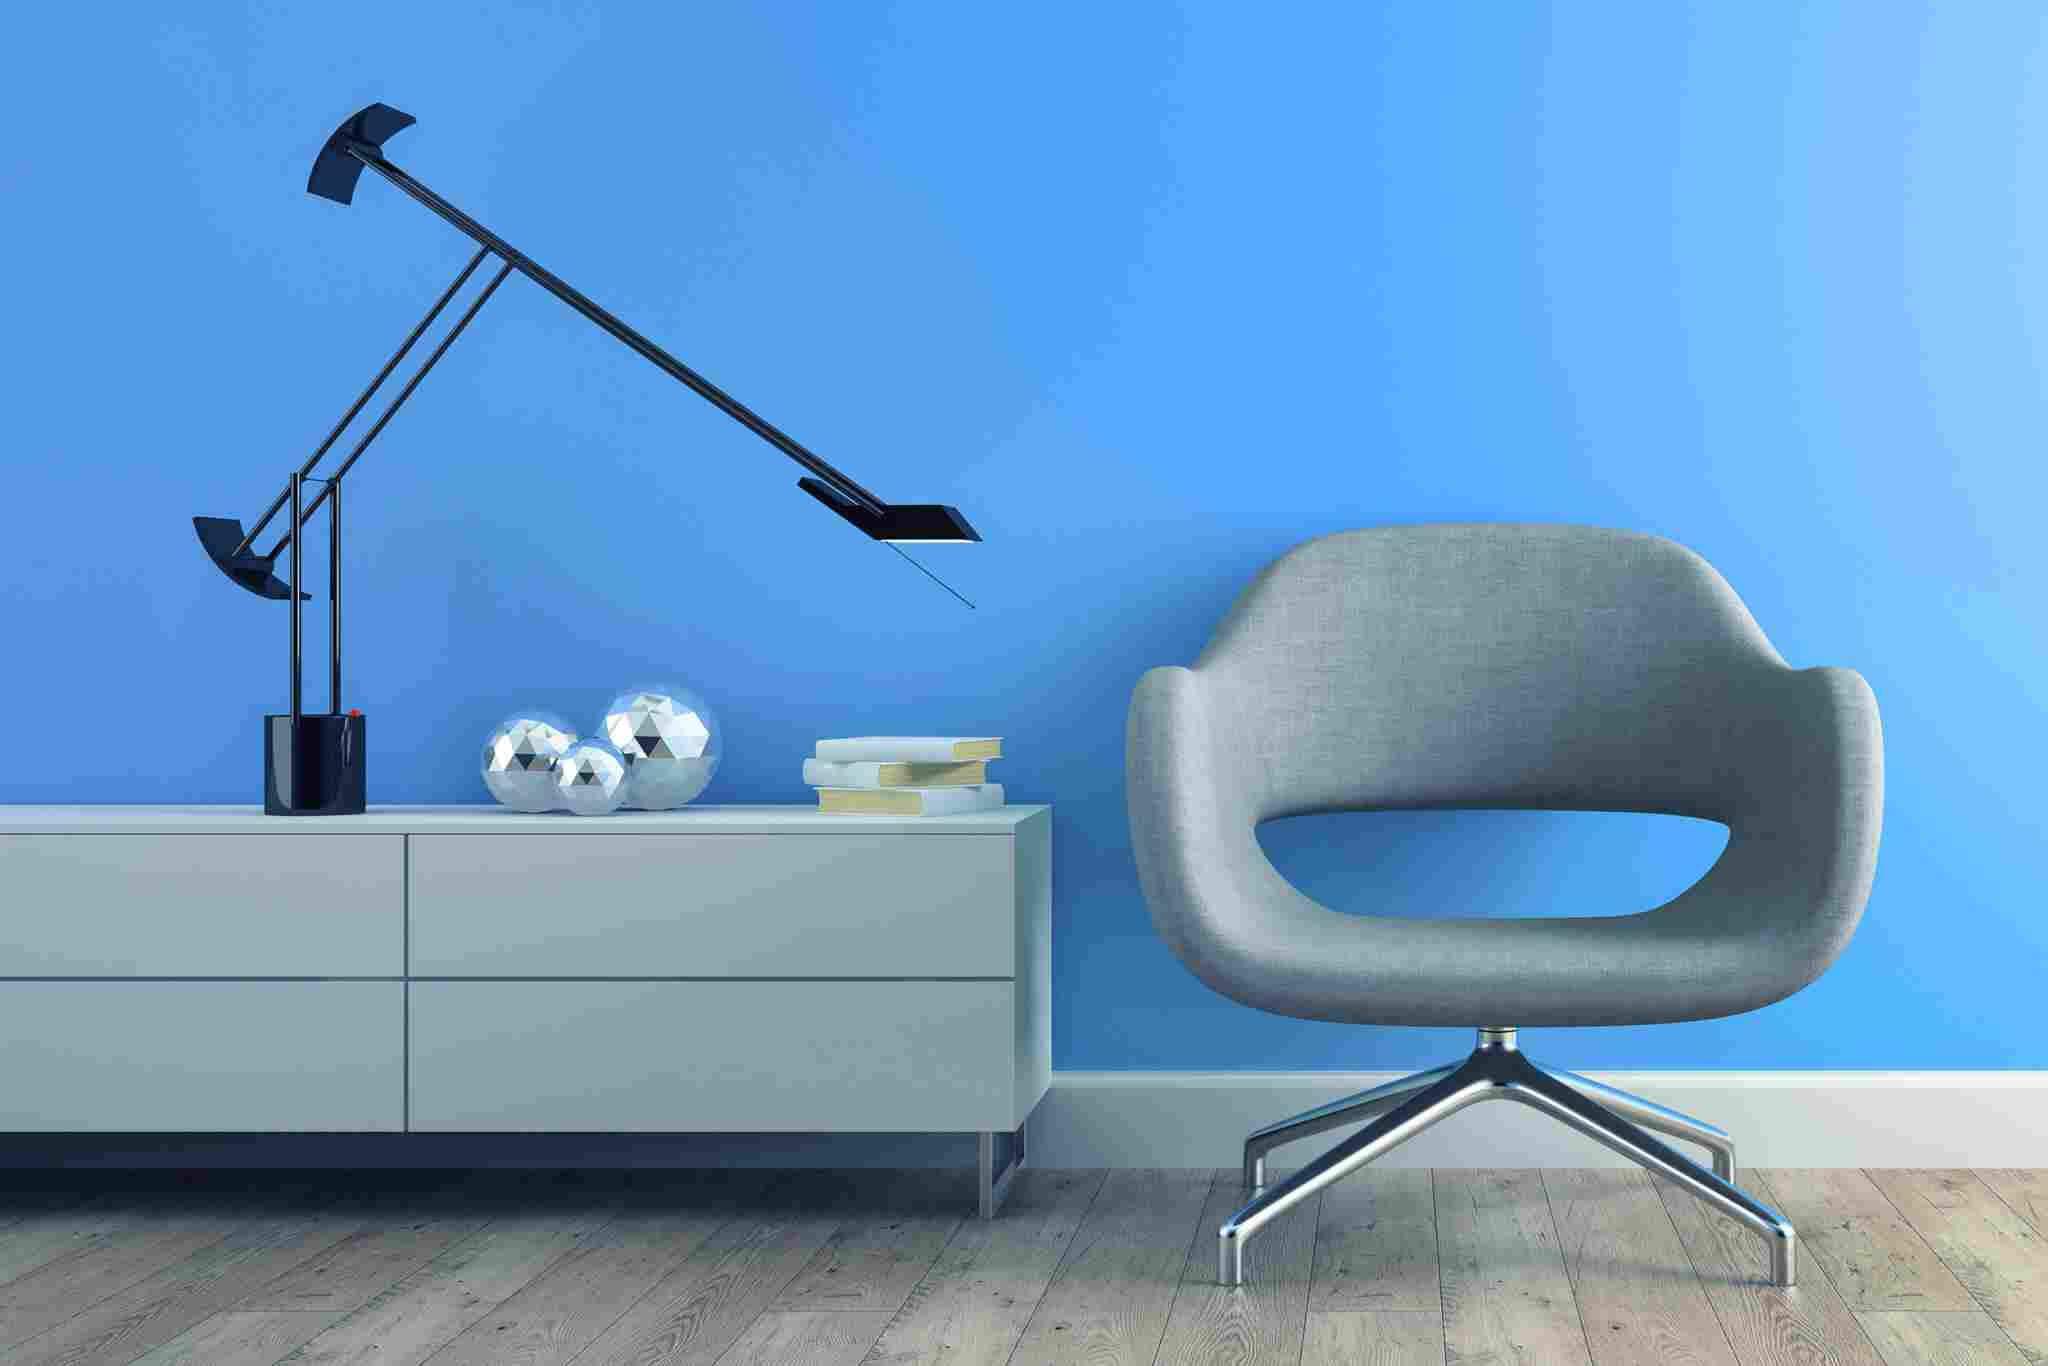 https://aguila-gmbh.de/wp-content/uploads/2017/05/image-chair-blue-wall.jpg